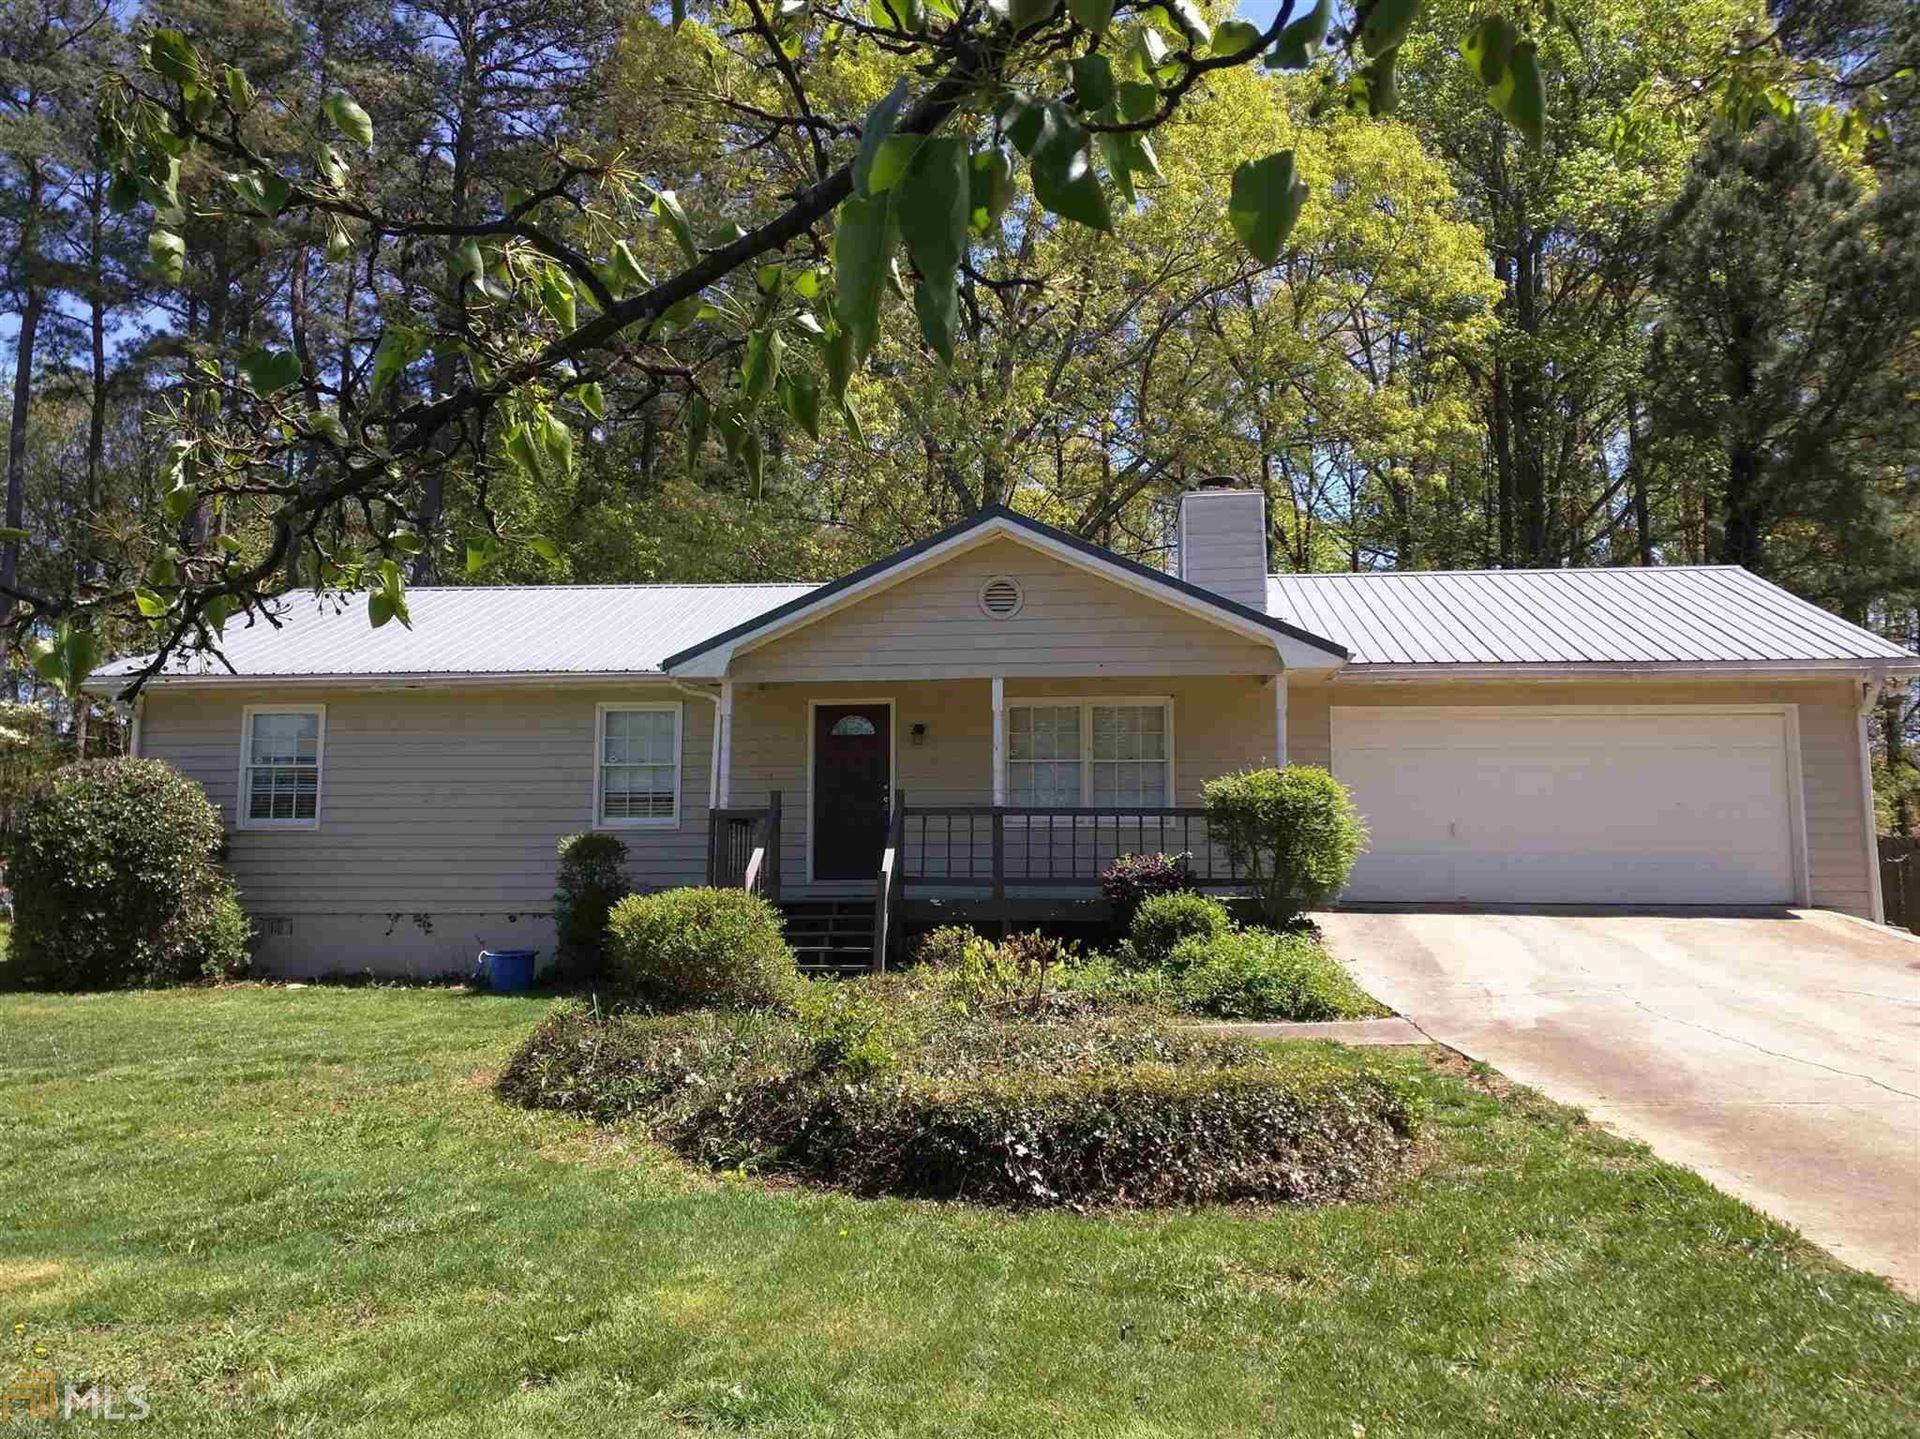 532 Peachtree Ridge, Lawrenceville, GA 30043 - #: 8954439